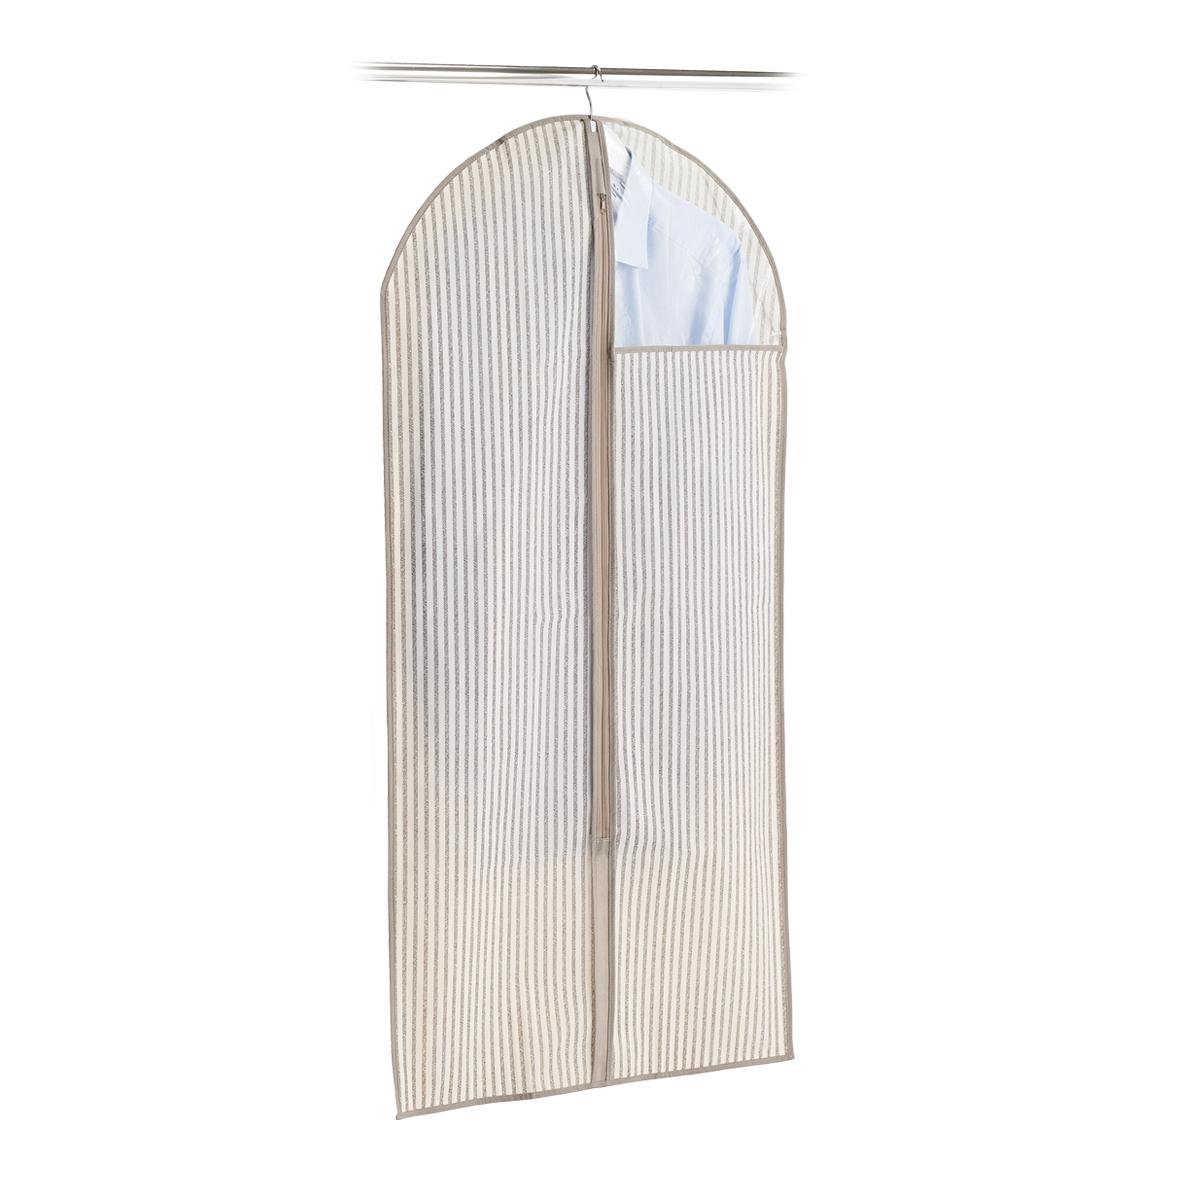 Husa textila pentru haine cu fermoar, Bej Stripes, l60xH120 cm imagine